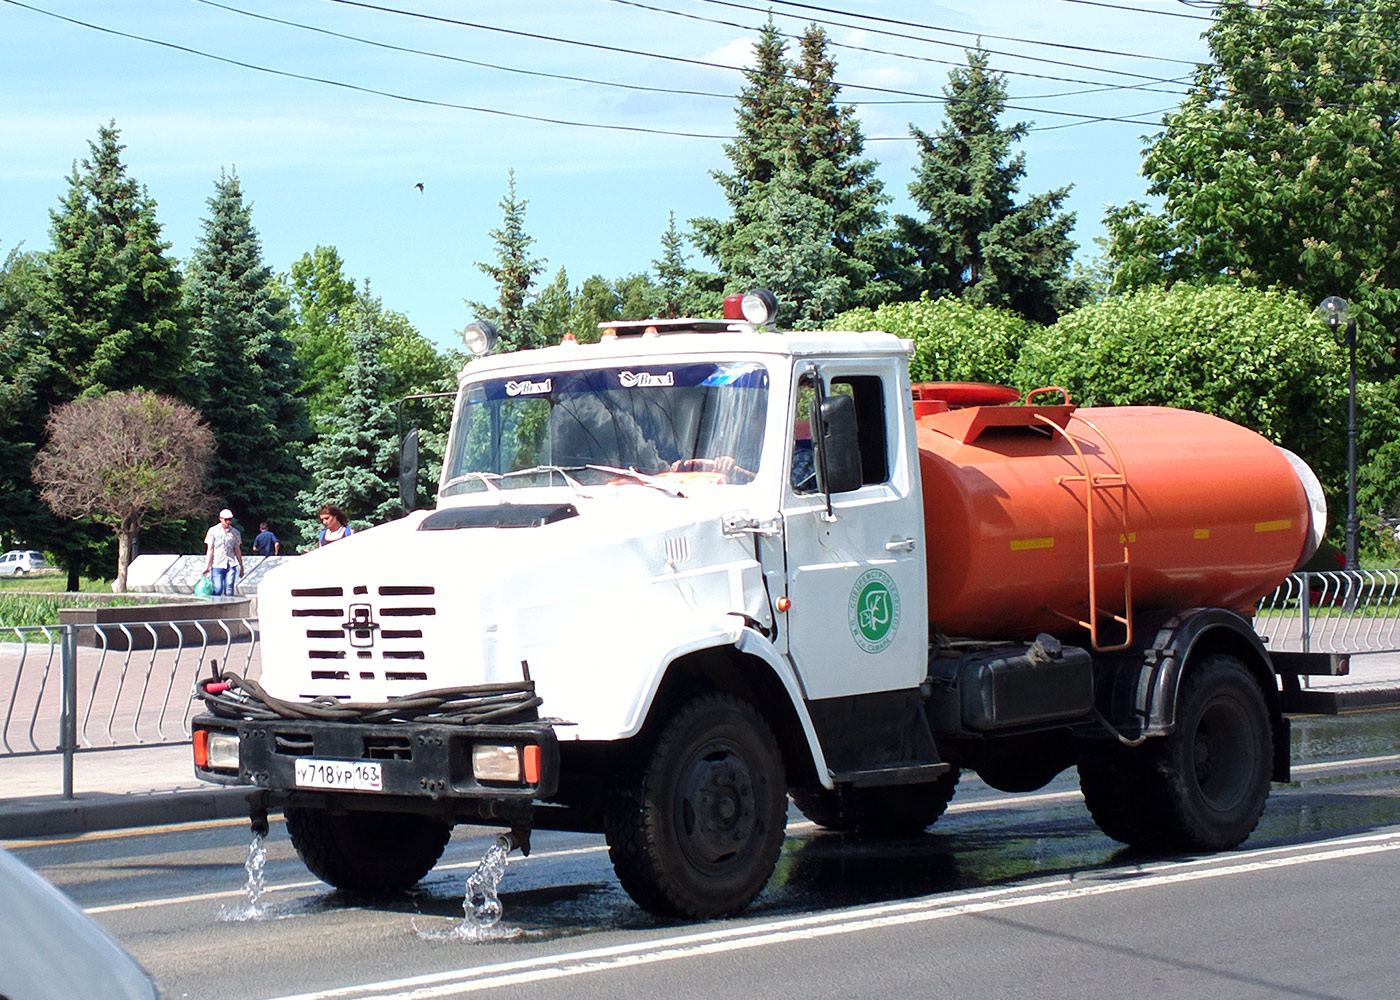 Поливомоечная машина МДК-433362 на шасси ЗиЛ-433362 #У718УР163. г. Самара, ул. Мичурина